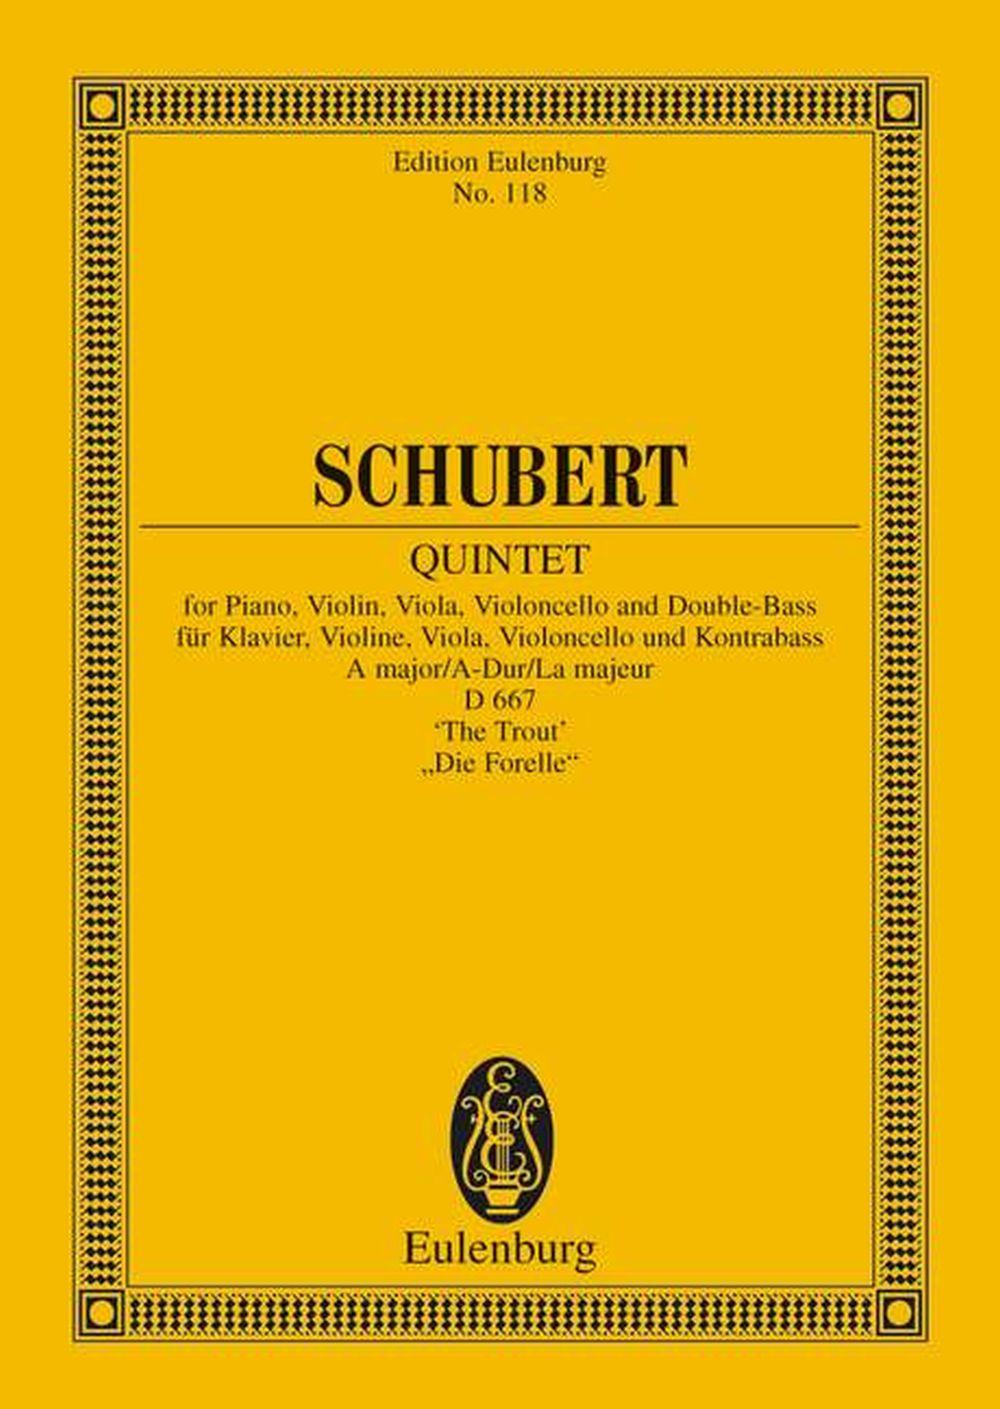 Franz Schubert: Piano Quintet In A Major D667 'The Trout': Piano Quintet: